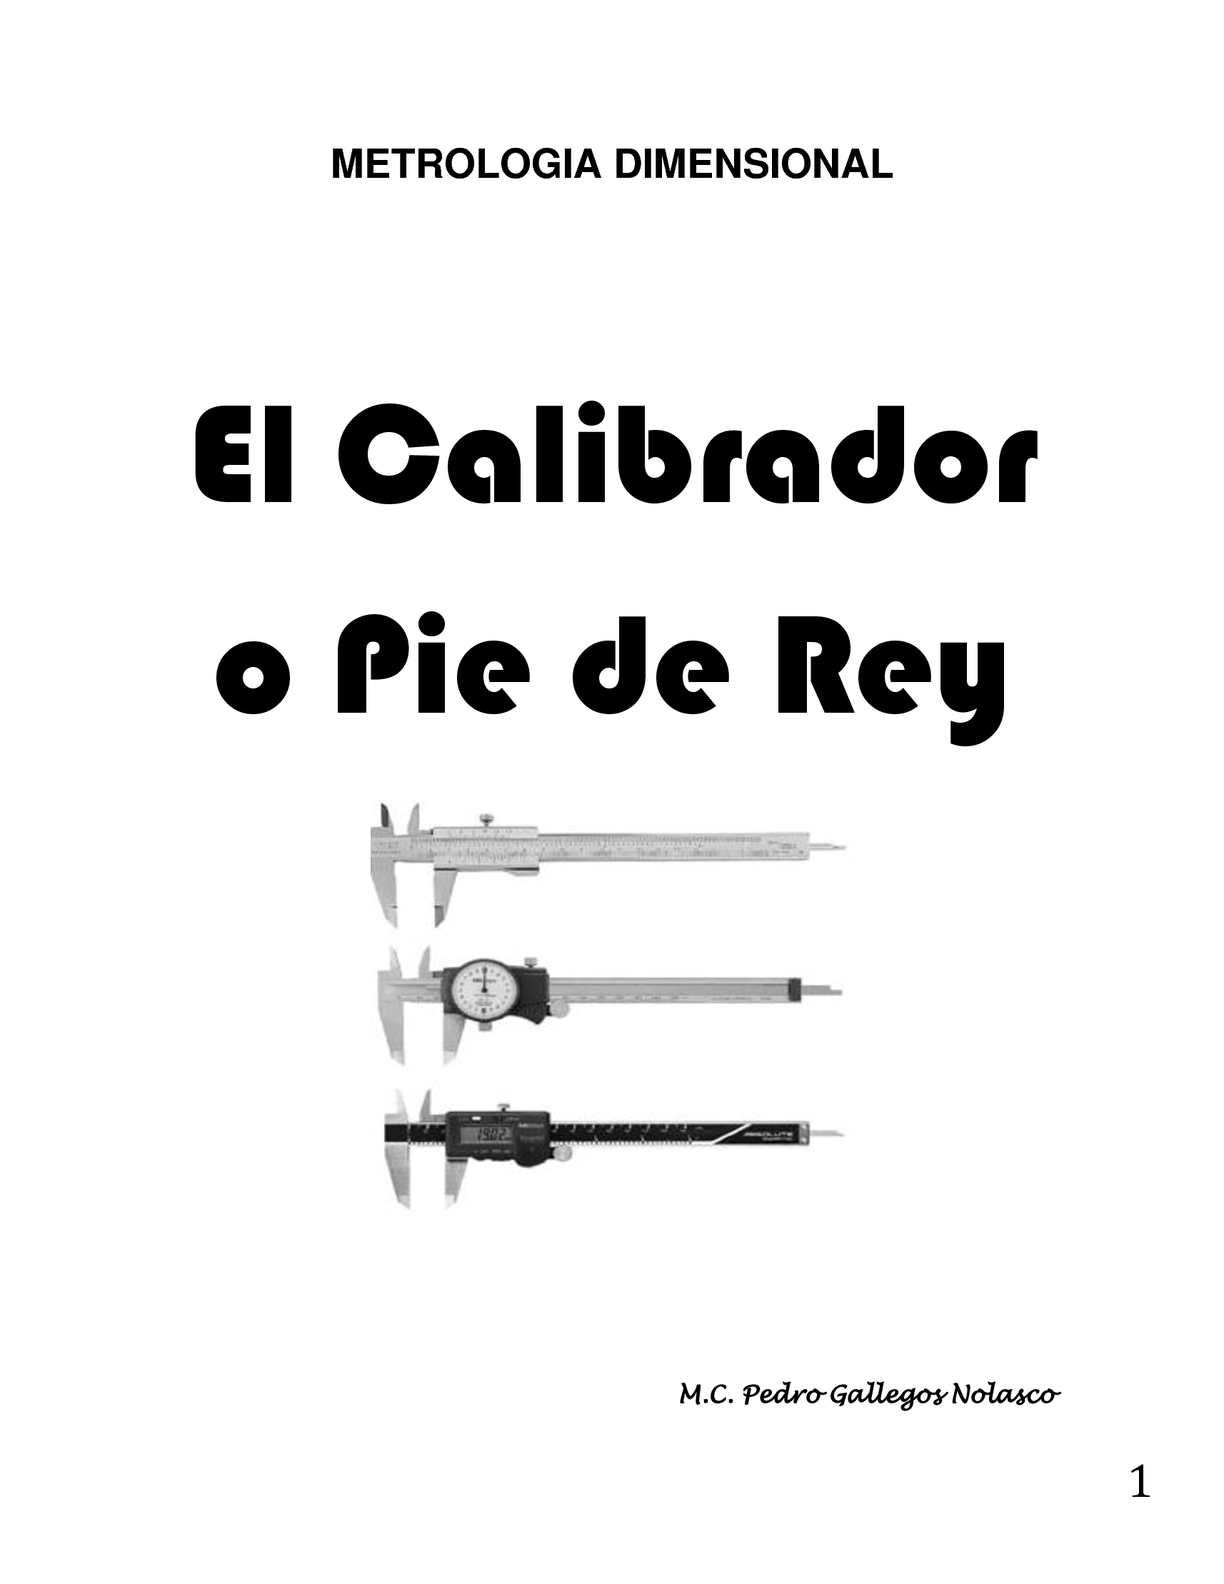 MANUAL CALIBRADOR PIE DE REY